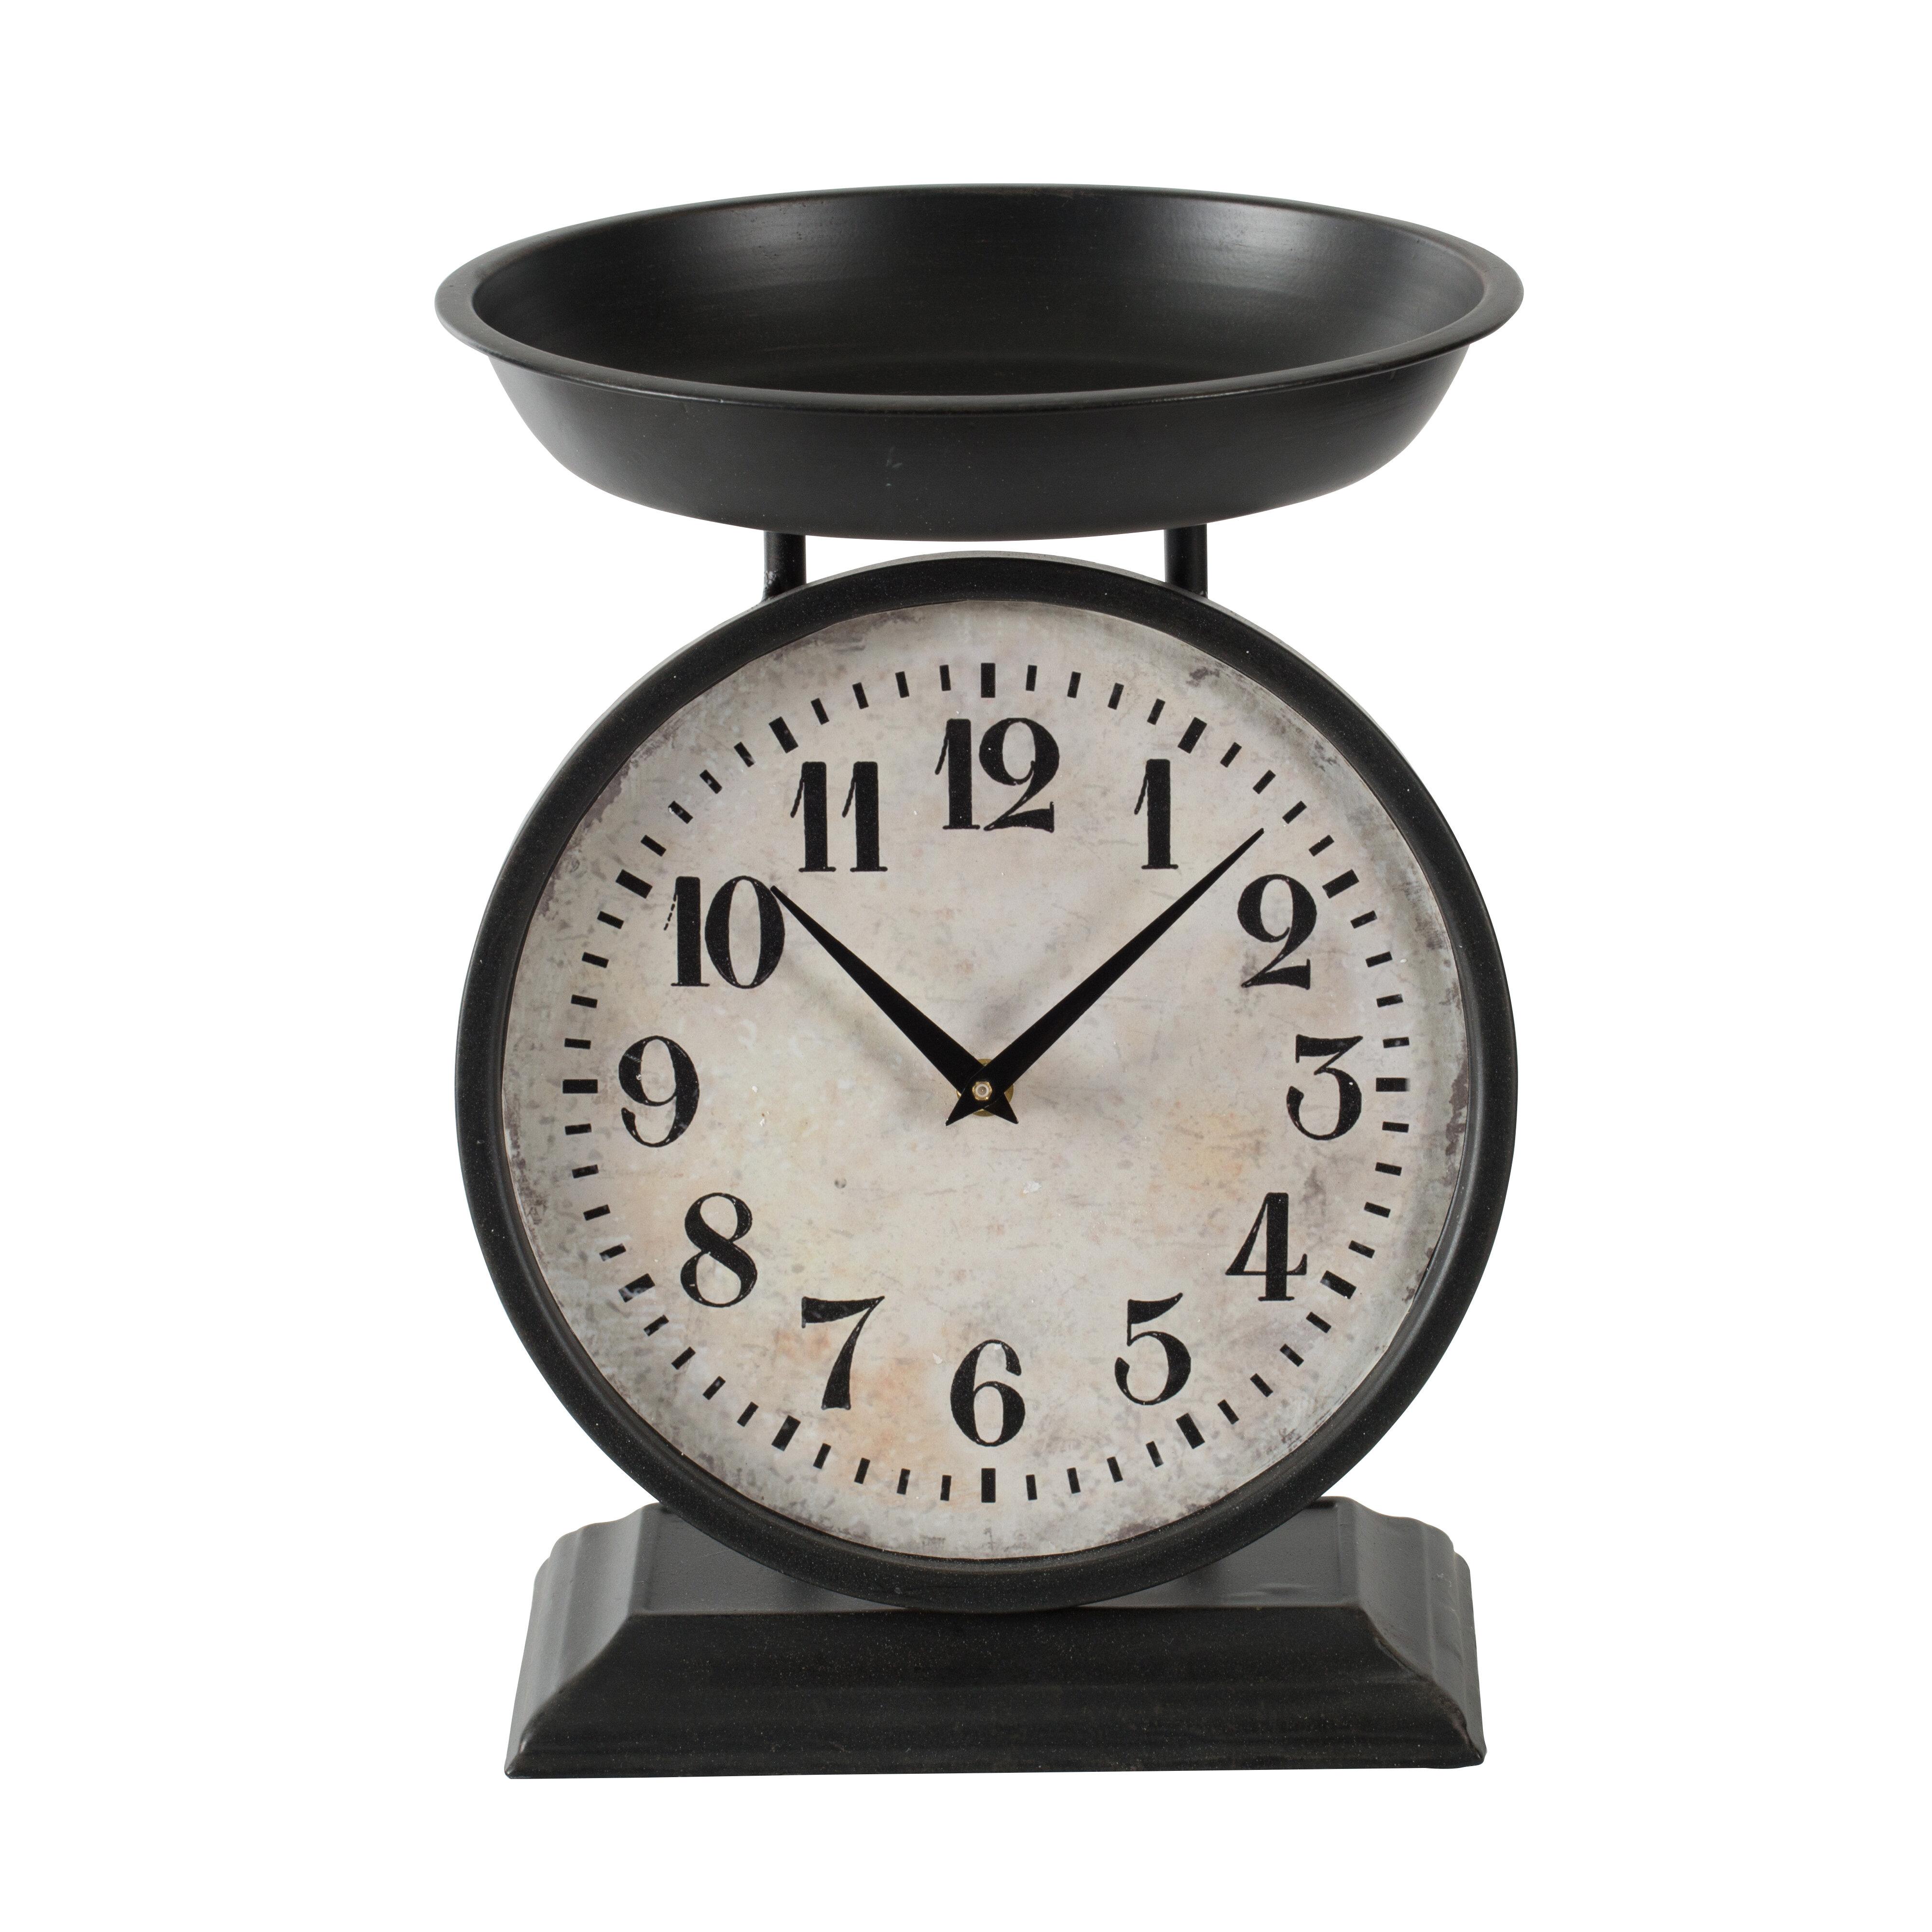 Rosalind Wheeler Mantel Tabletop Clocks You Ll Love In 2021 Wayfair